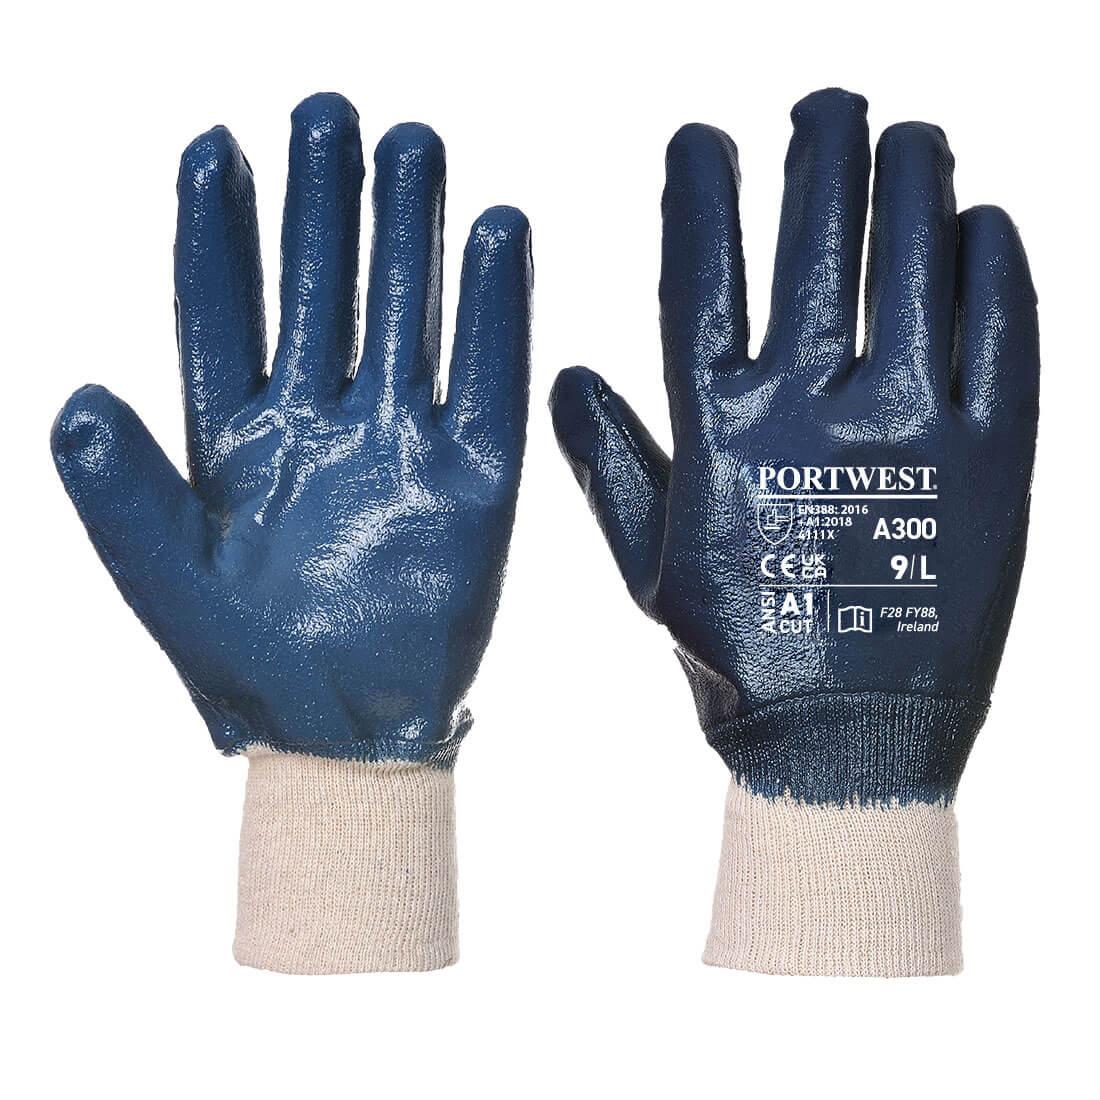 Nitrile Knitwrist Glove, Navy       Size Large R/Fit